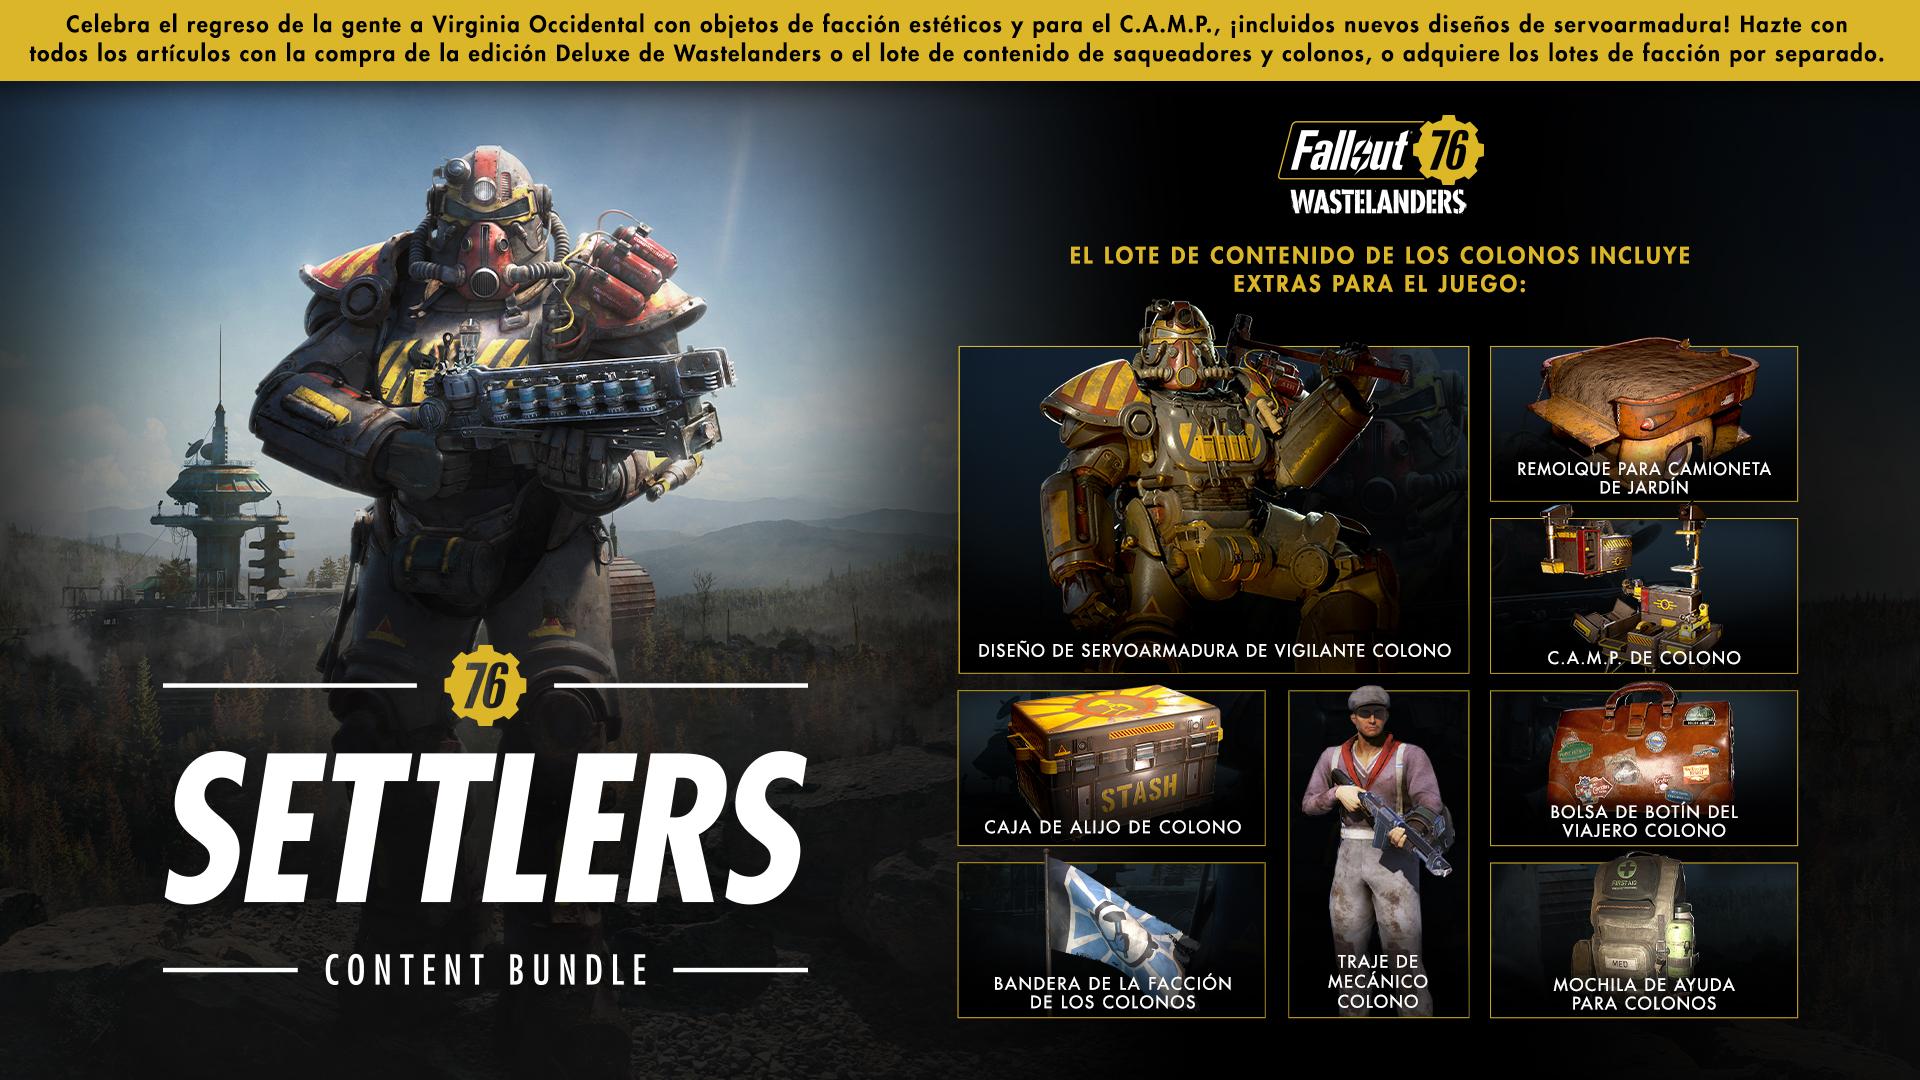 Fallout76-Wastelanders SettlersVanity 1920x1080-02-ES